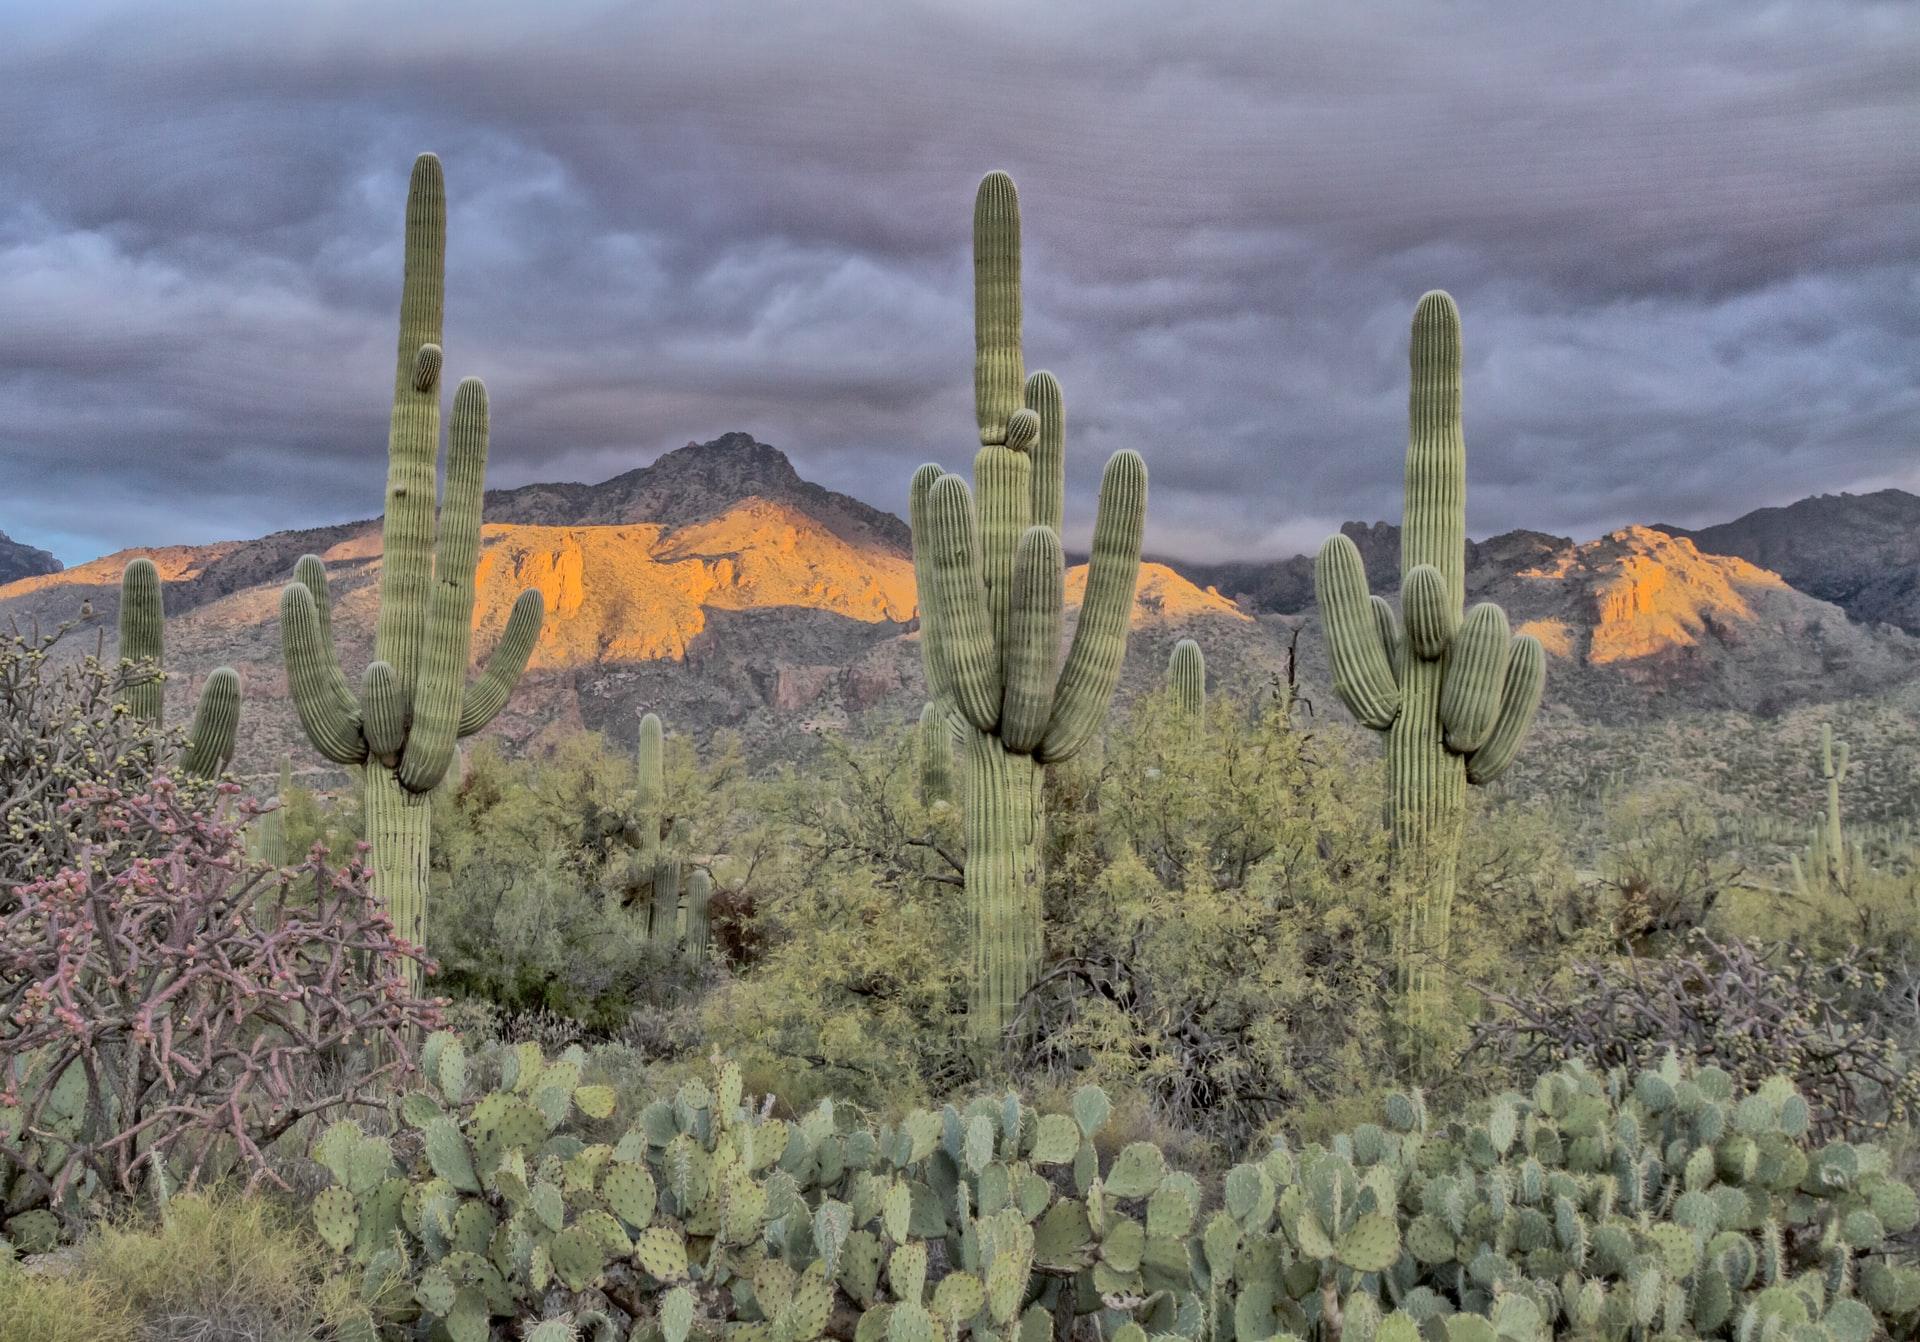 Sabino Canyon, Catalina Foothills, AZ, Saguaro Cactus, examples of felony crimes